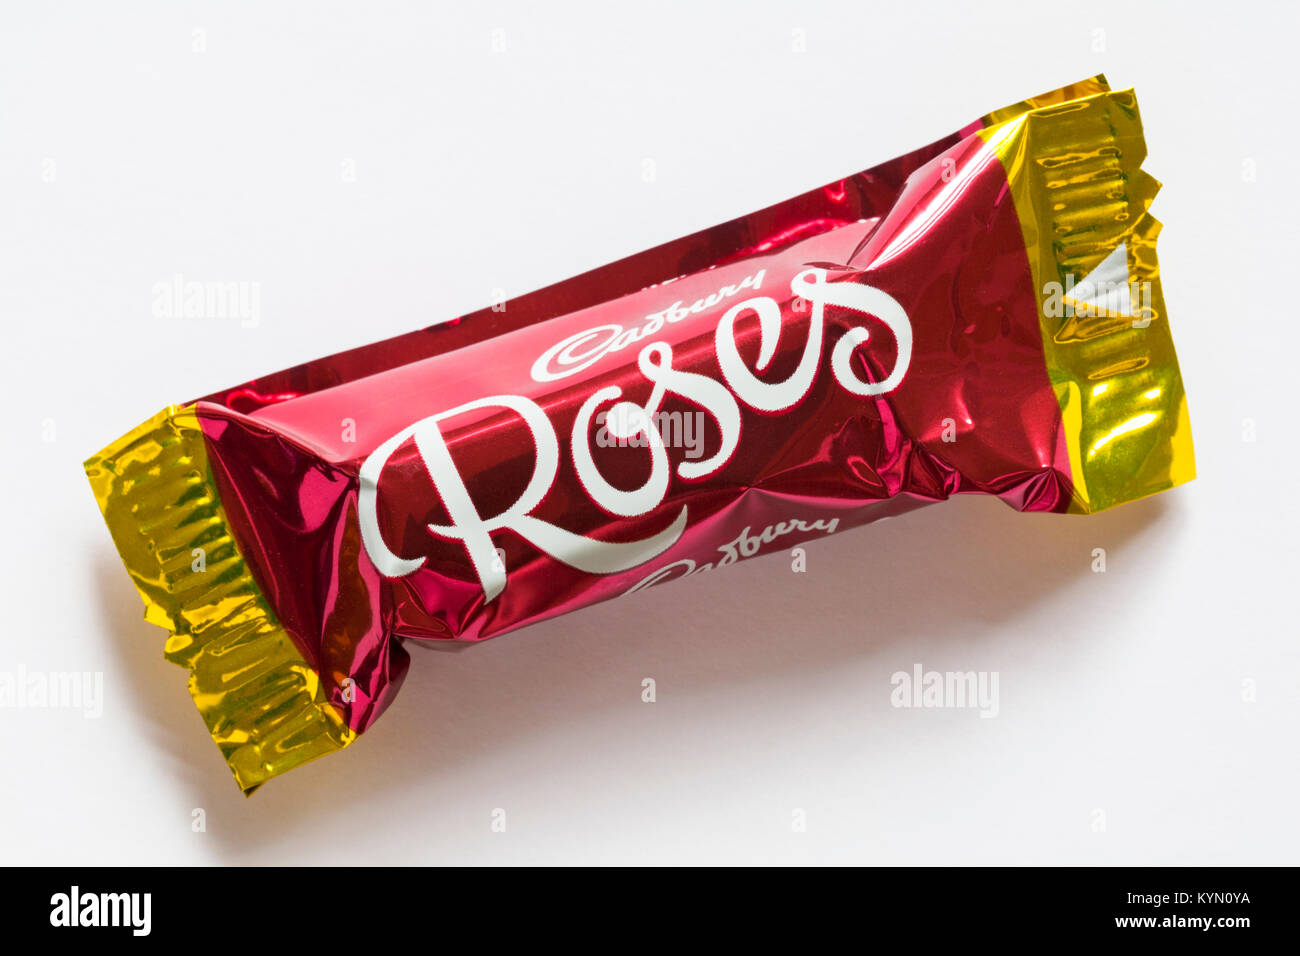 Cadbury Roses Brazilian Darkness chocolate isolated on white background - Cadbury Roses chocolates - Stock Image